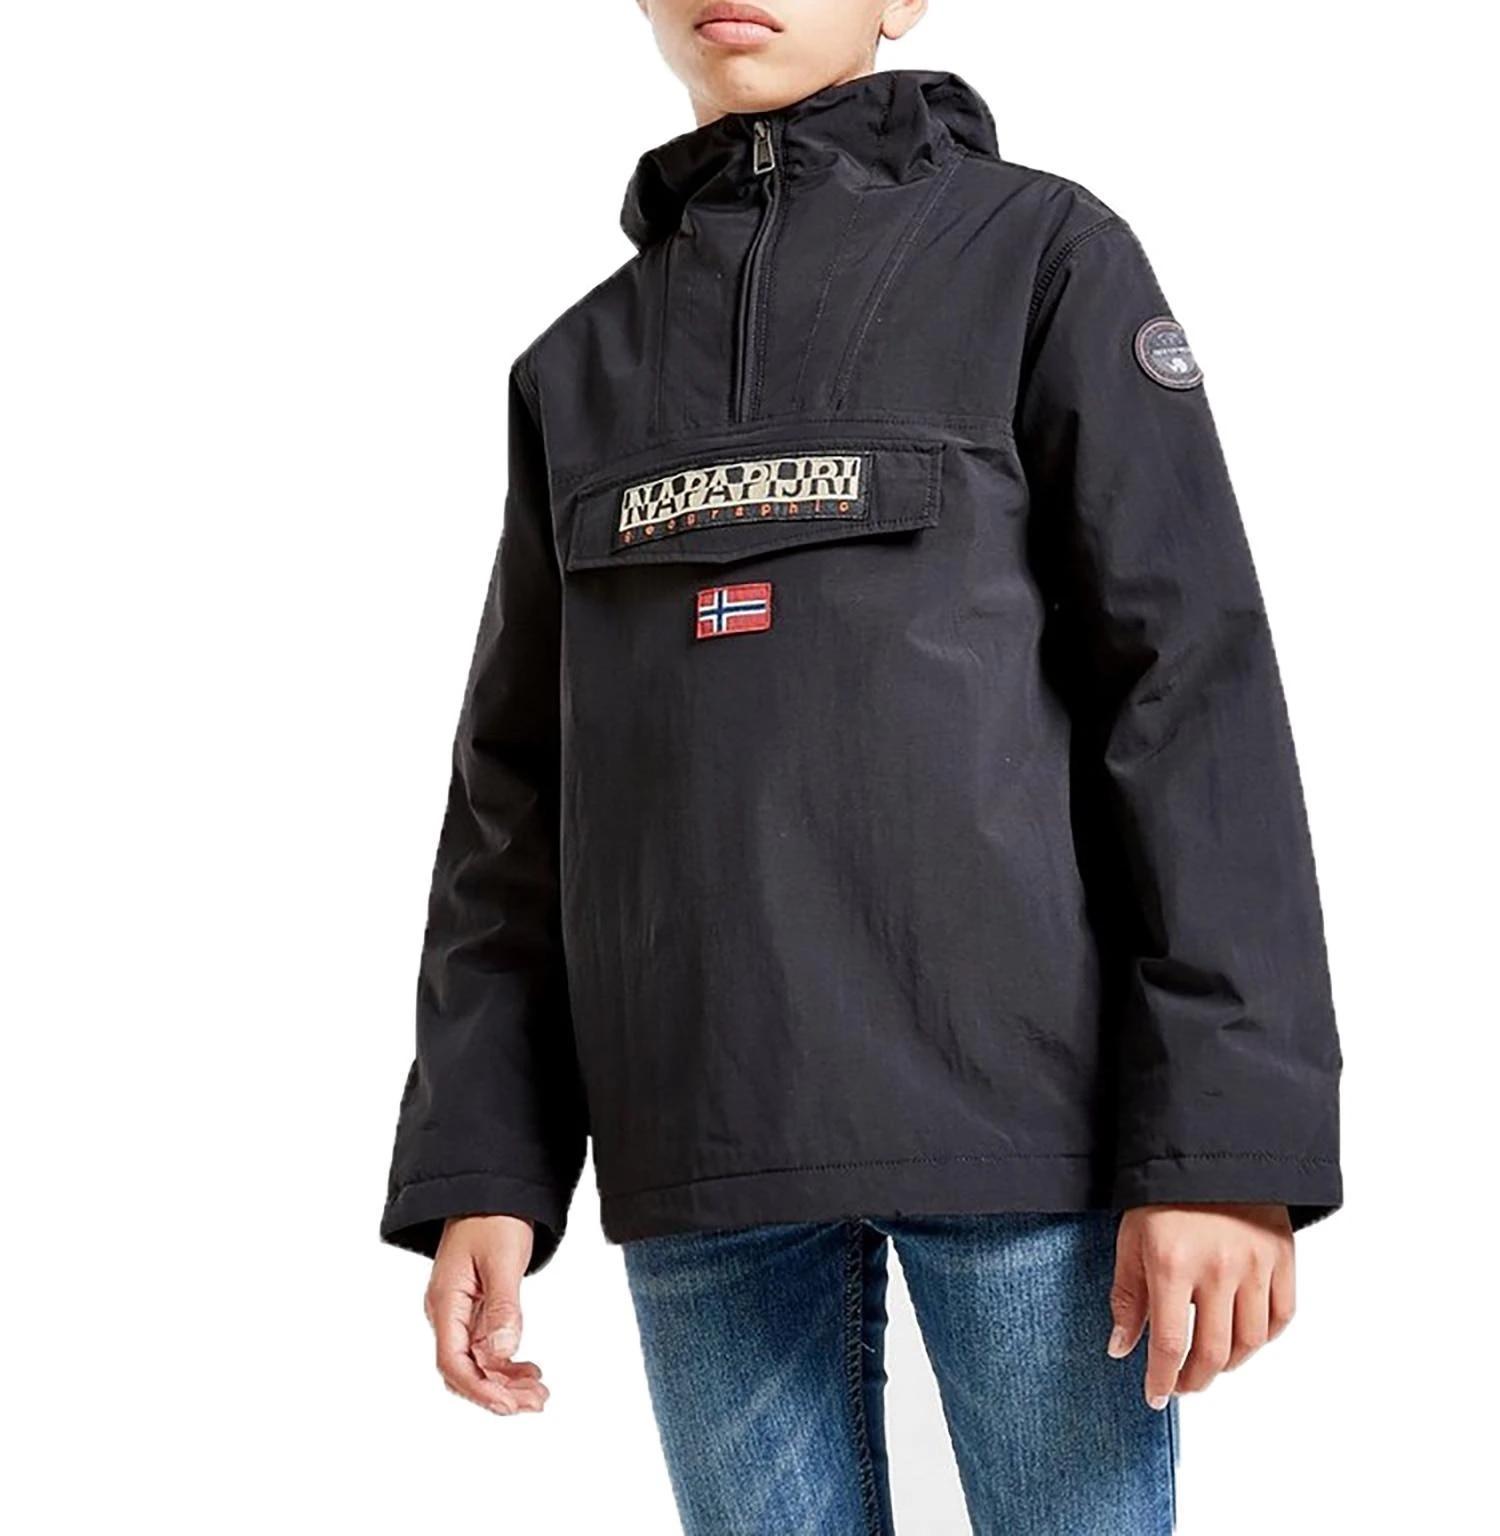 Napapijri Boys Jacket